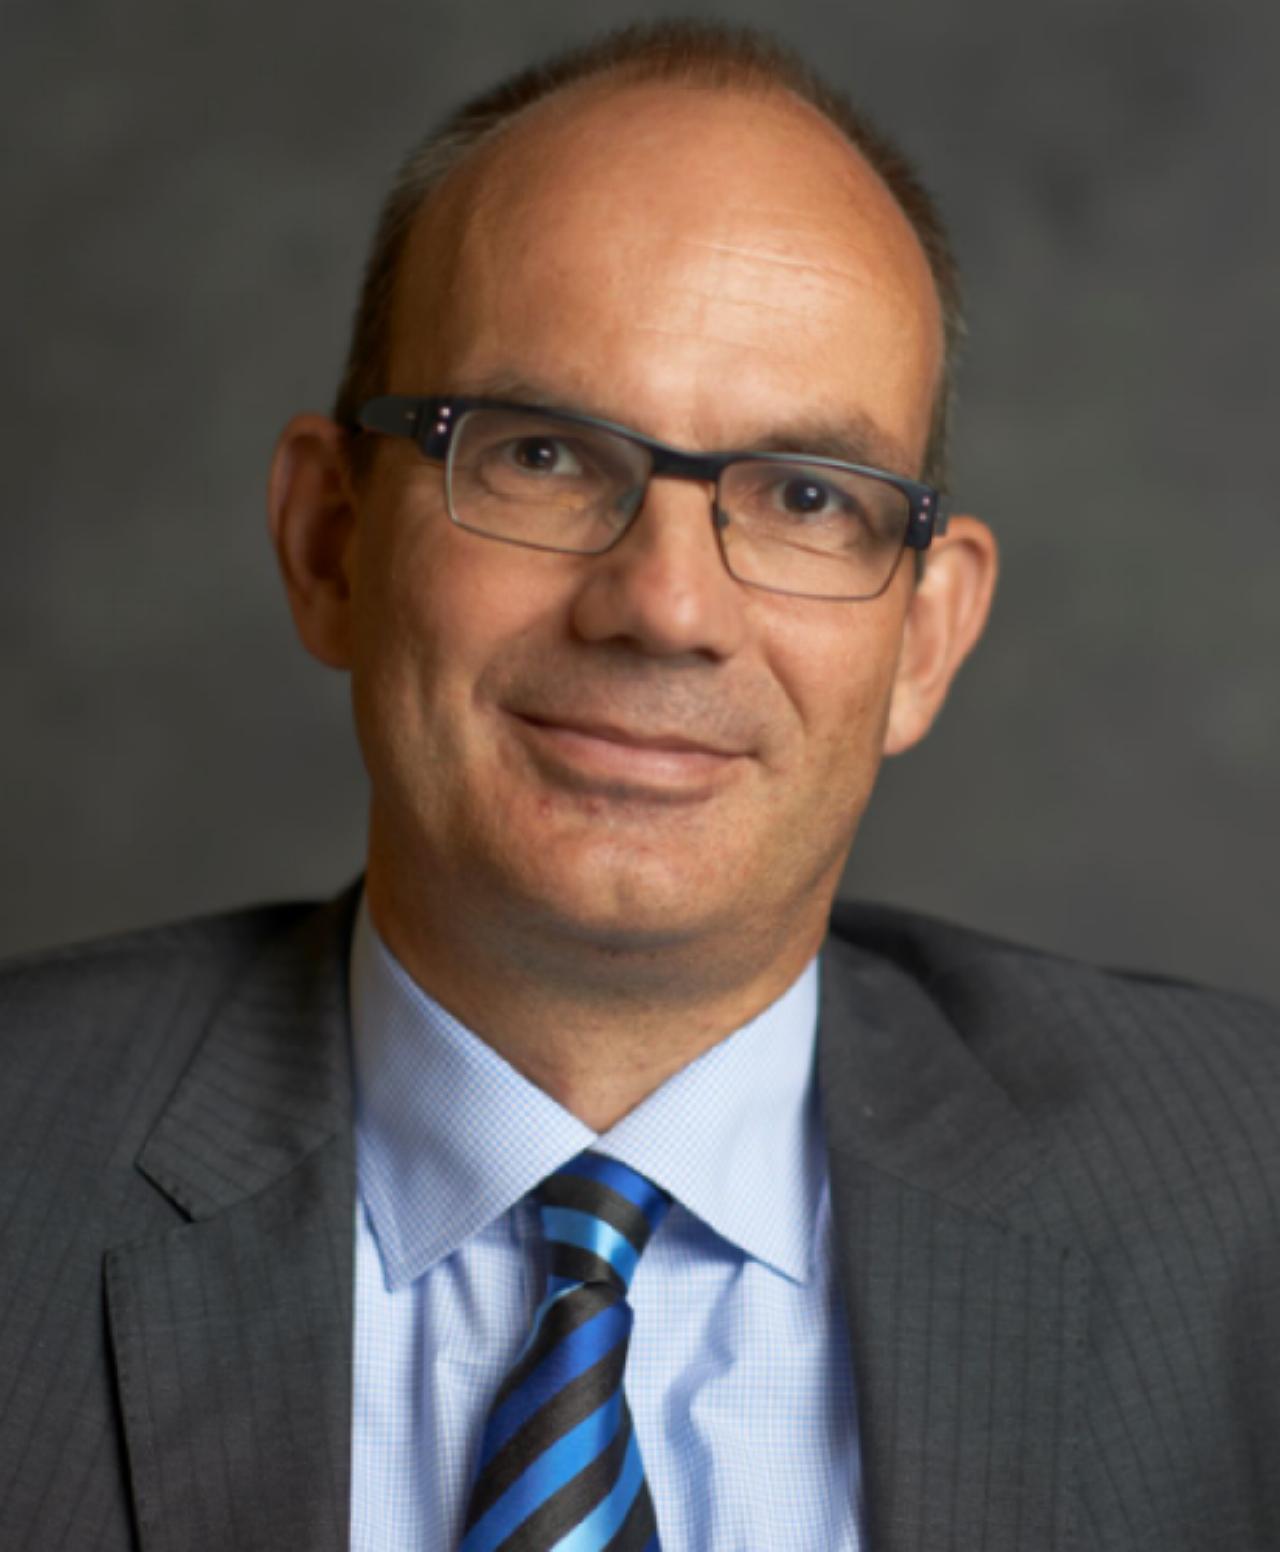 Christian Ketels Headshot